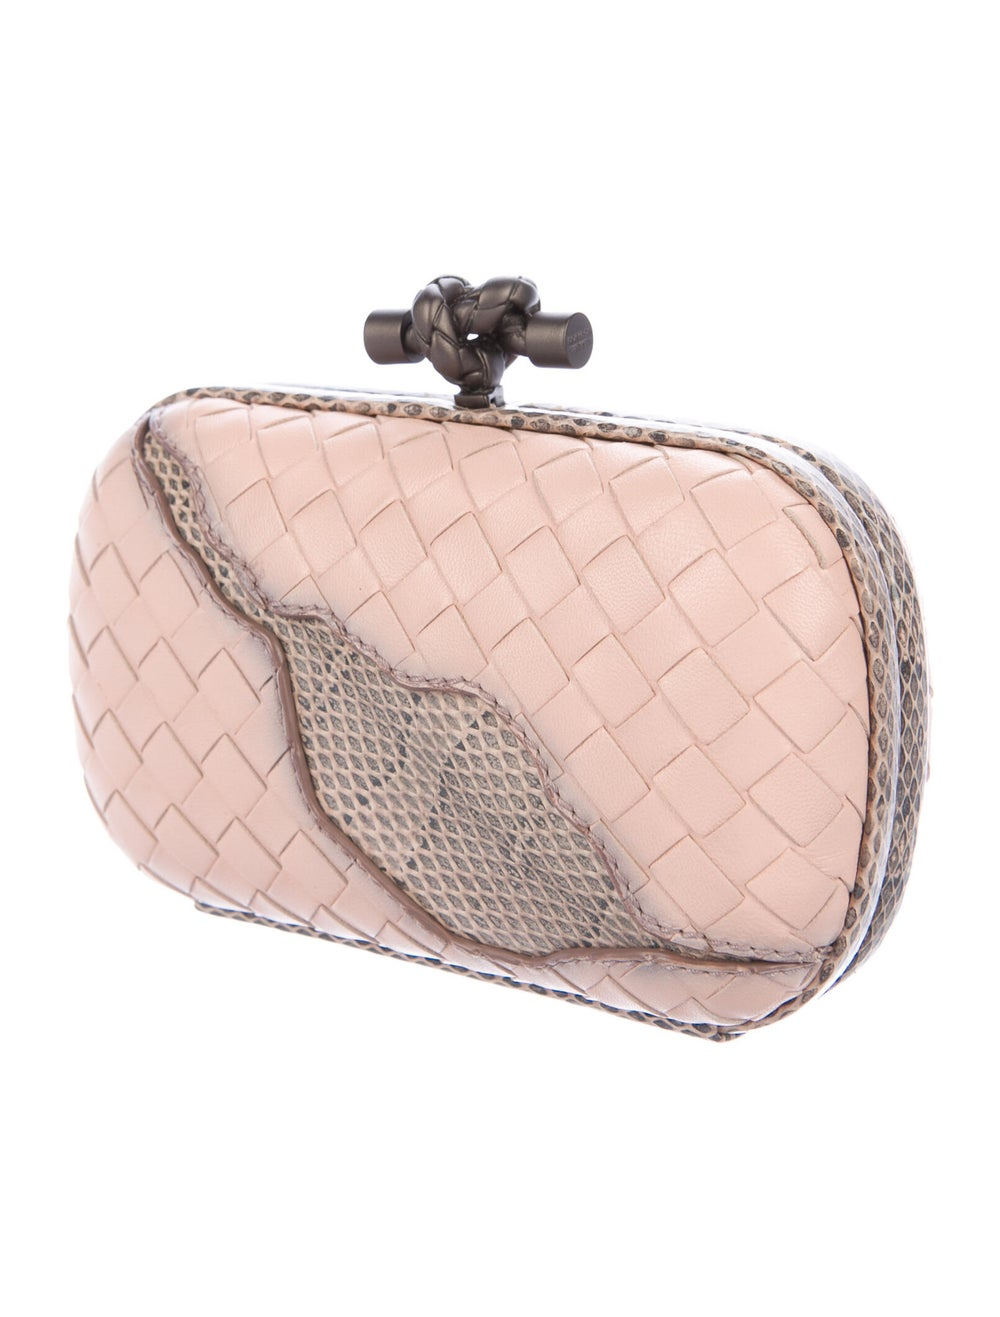 Bottega Veneta Ayers-Trimmed Box Clutch Pink - image 3